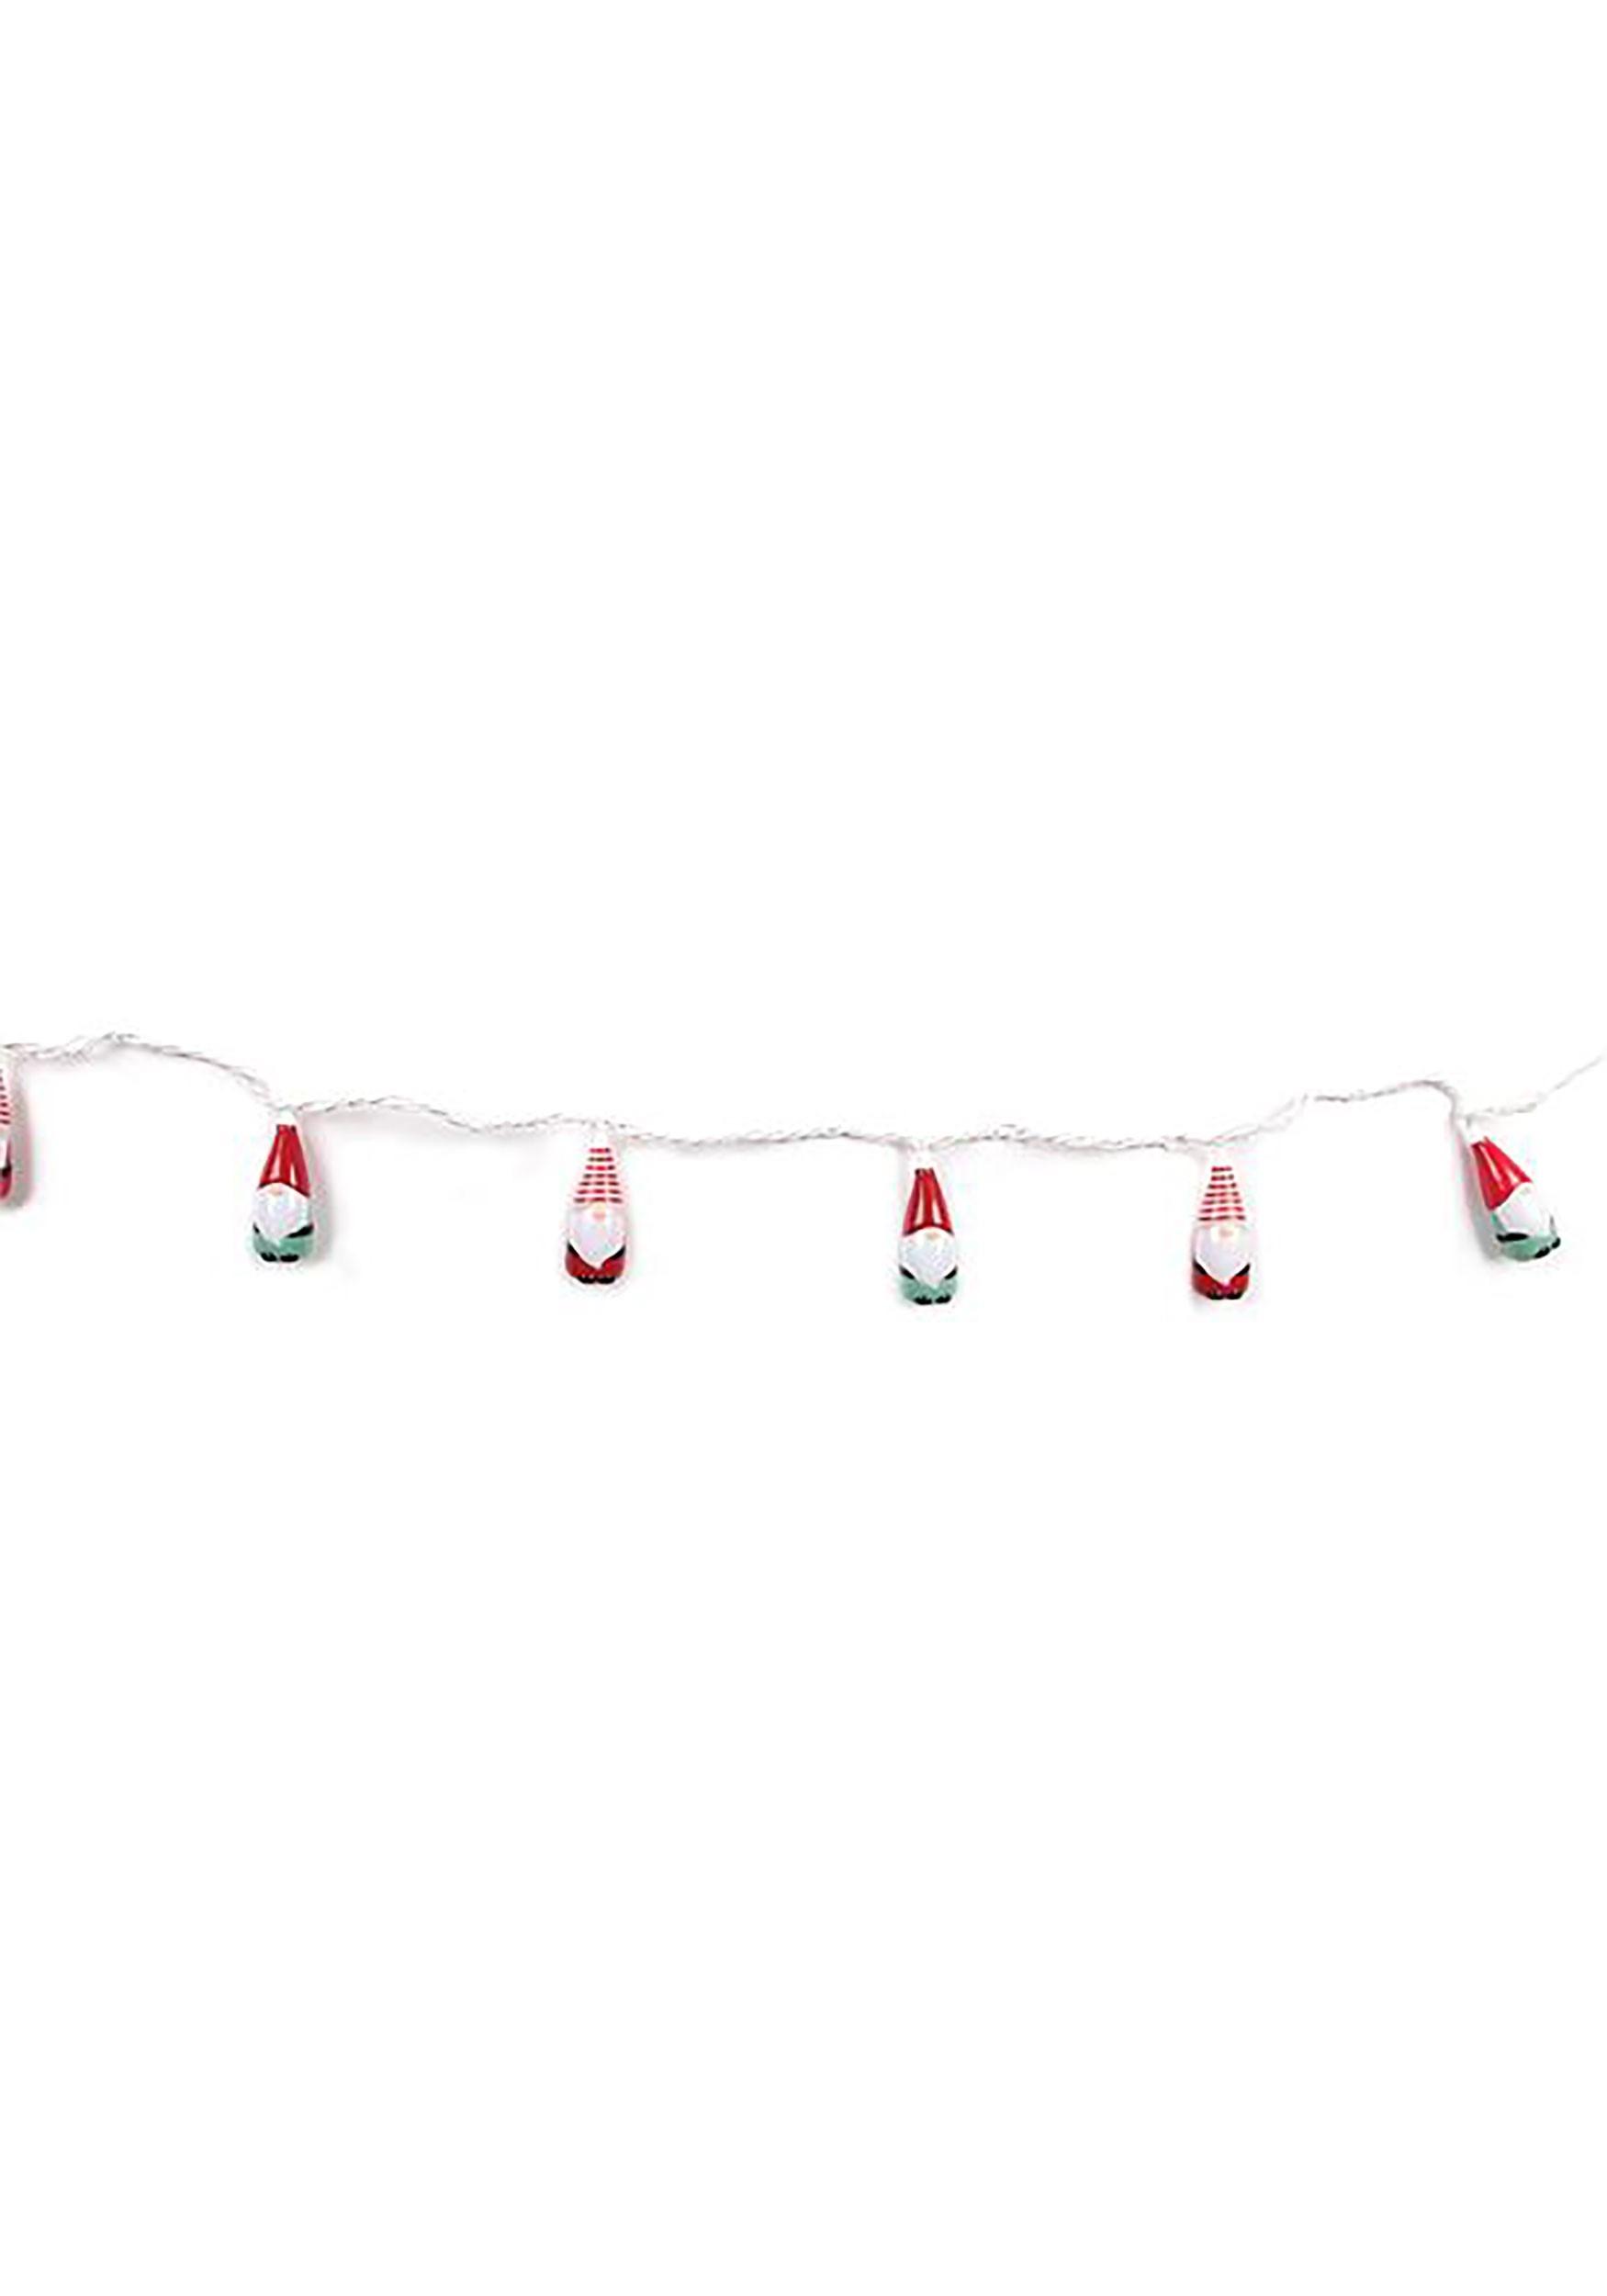 10 Gnome String Lights Set